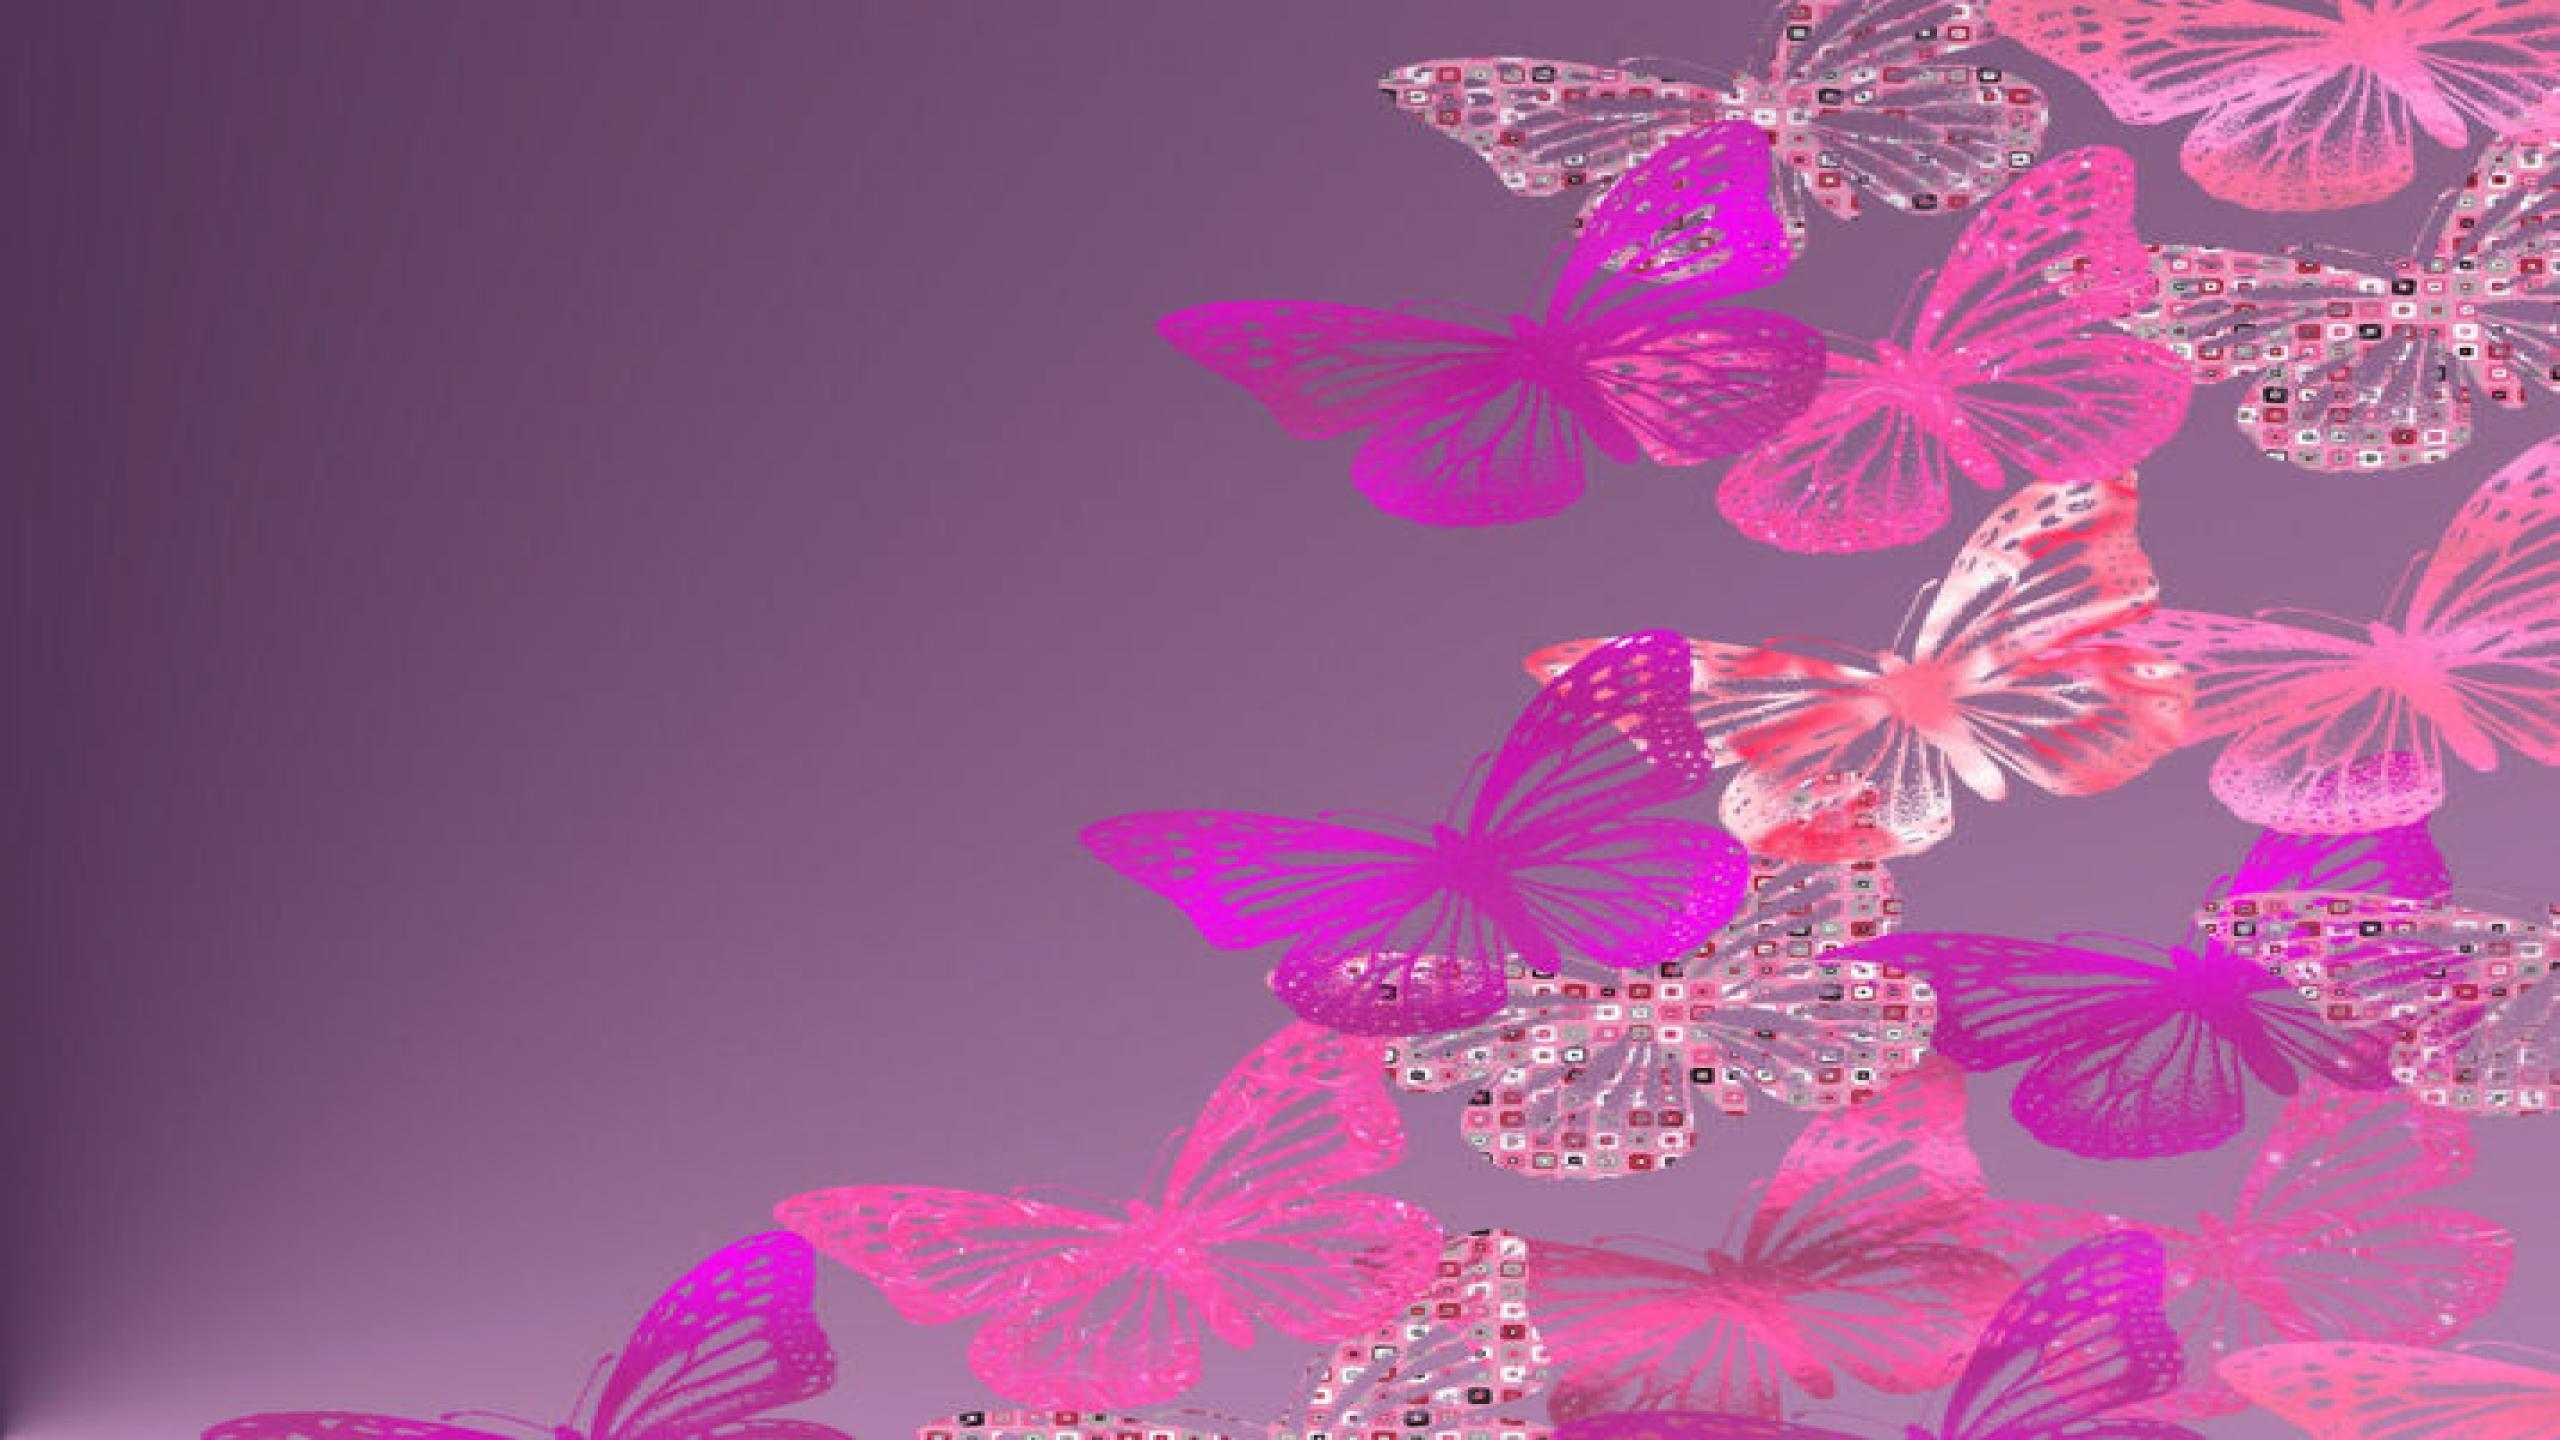 Pink Butterfly Live Wallpaper - Butterfly Cartoon Wallpaper Hd , HD Wallpaper & Backgrounds